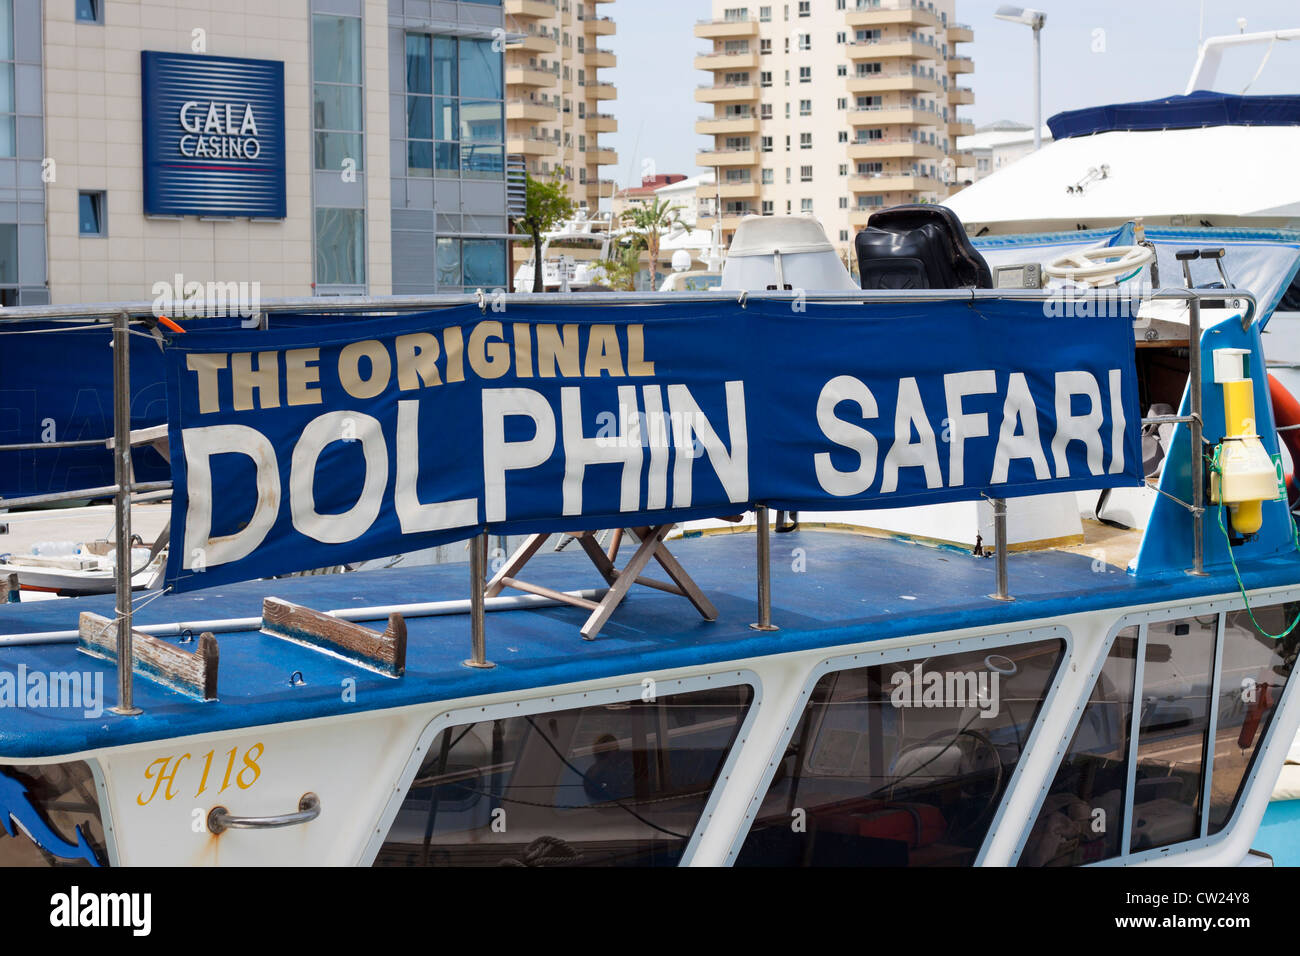 Dolphin Safari boat at Ocean Village, Gibraltar. - Stock Image